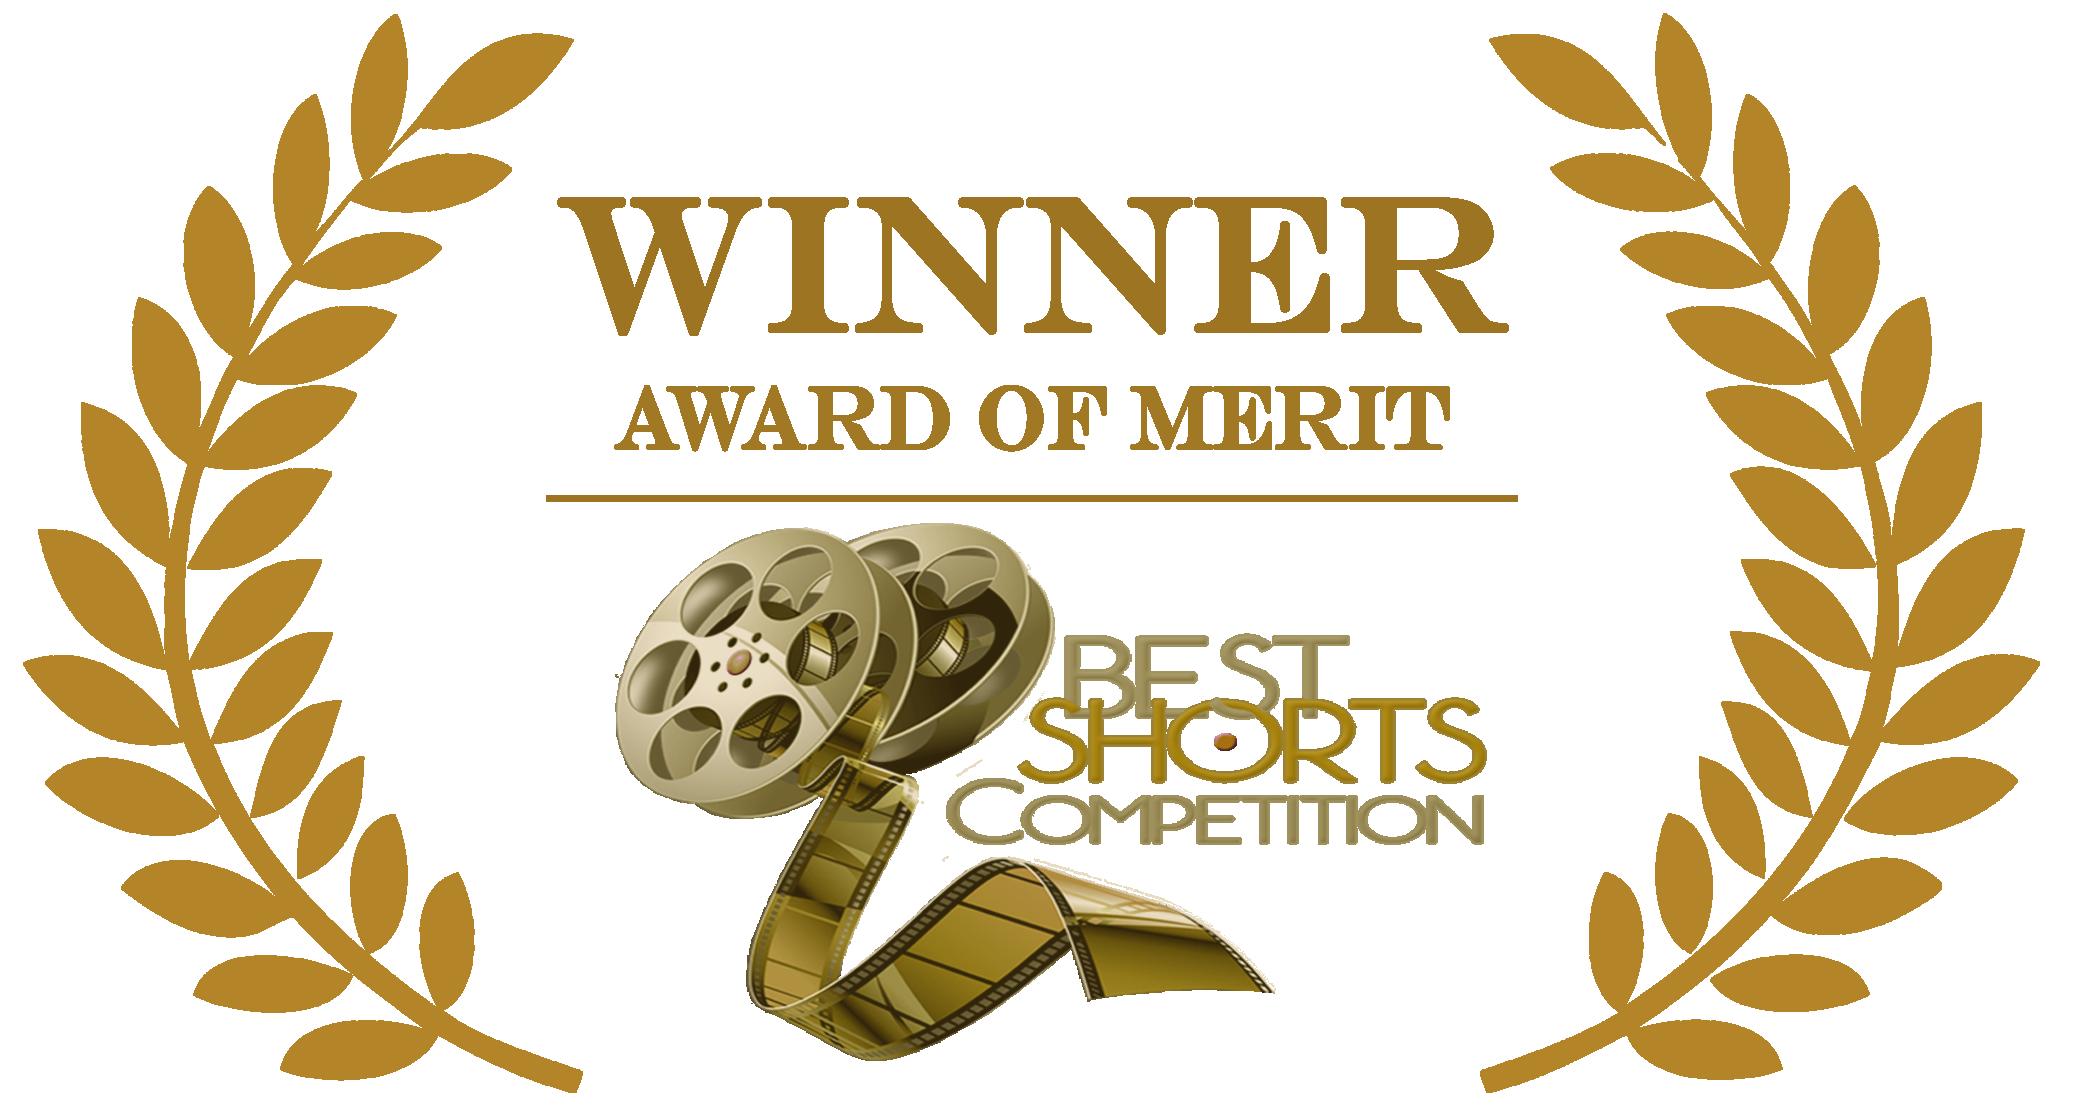 BEST-SHORTS-MERIT-logo-gold.png